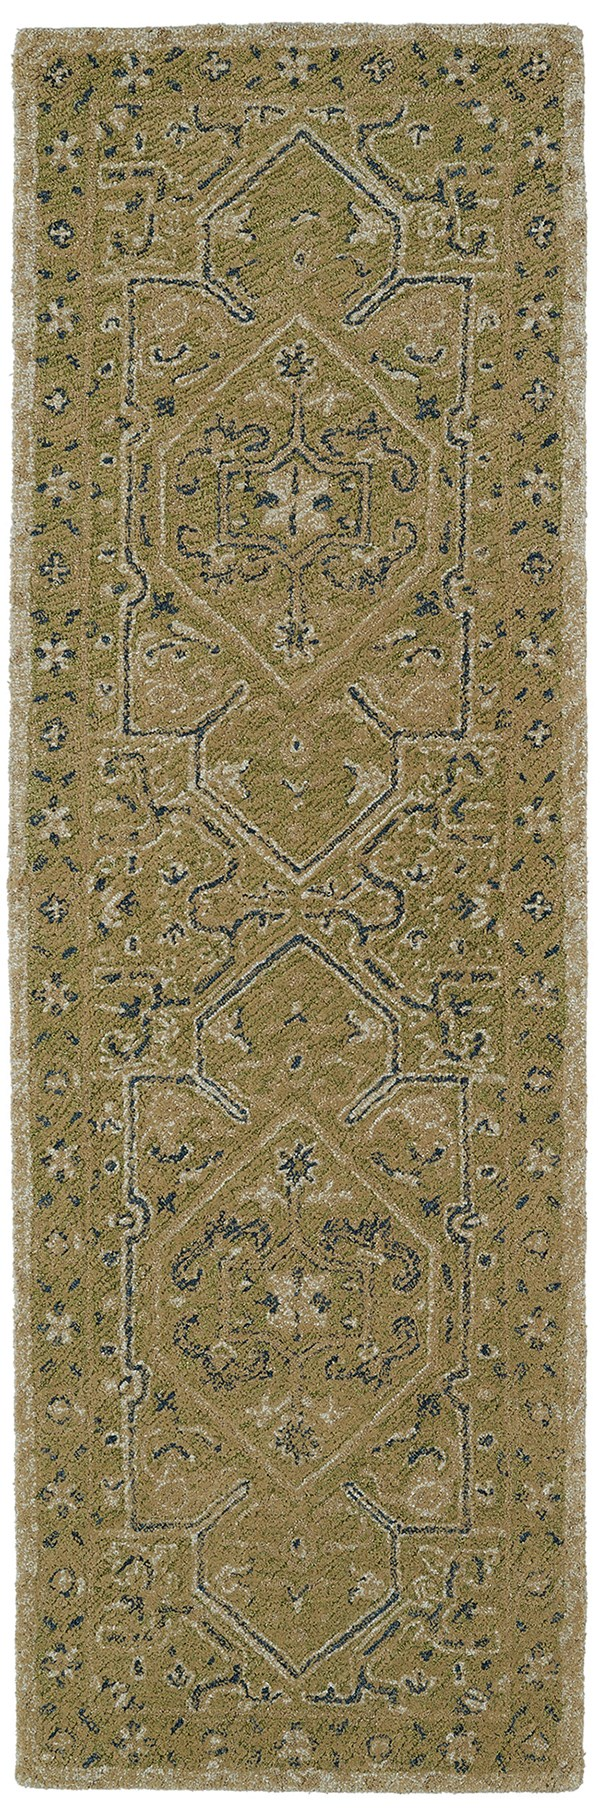 Green, Denim, Light Brown (50) Traditional / Oriental Area Rug